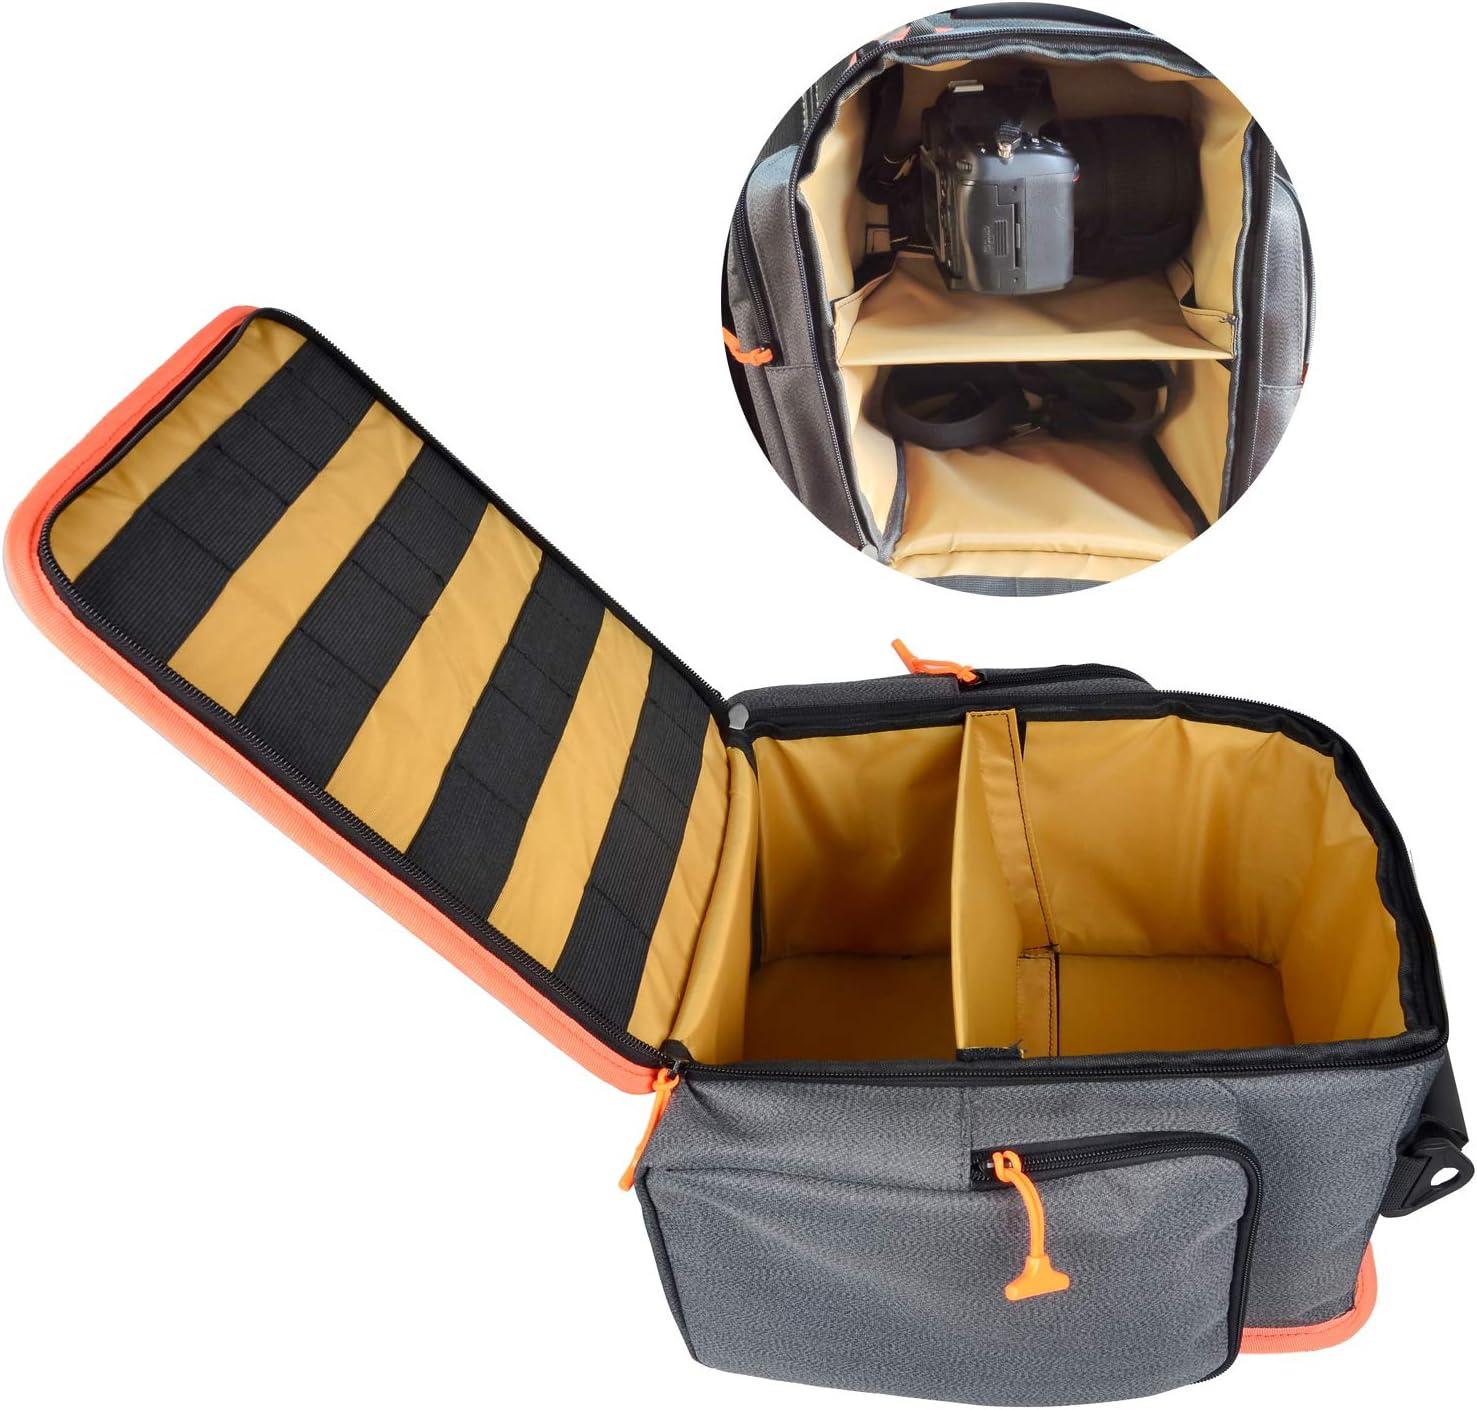 Gary Sresk Wrangler Interior Accessories Under Seat Storage Bag Organizer for Wrangler JK JL JLU Sports Rubicon Gladiator JT Backseat Rear Under Seat Storage Bags Portable Storage Tool Kits Pocket